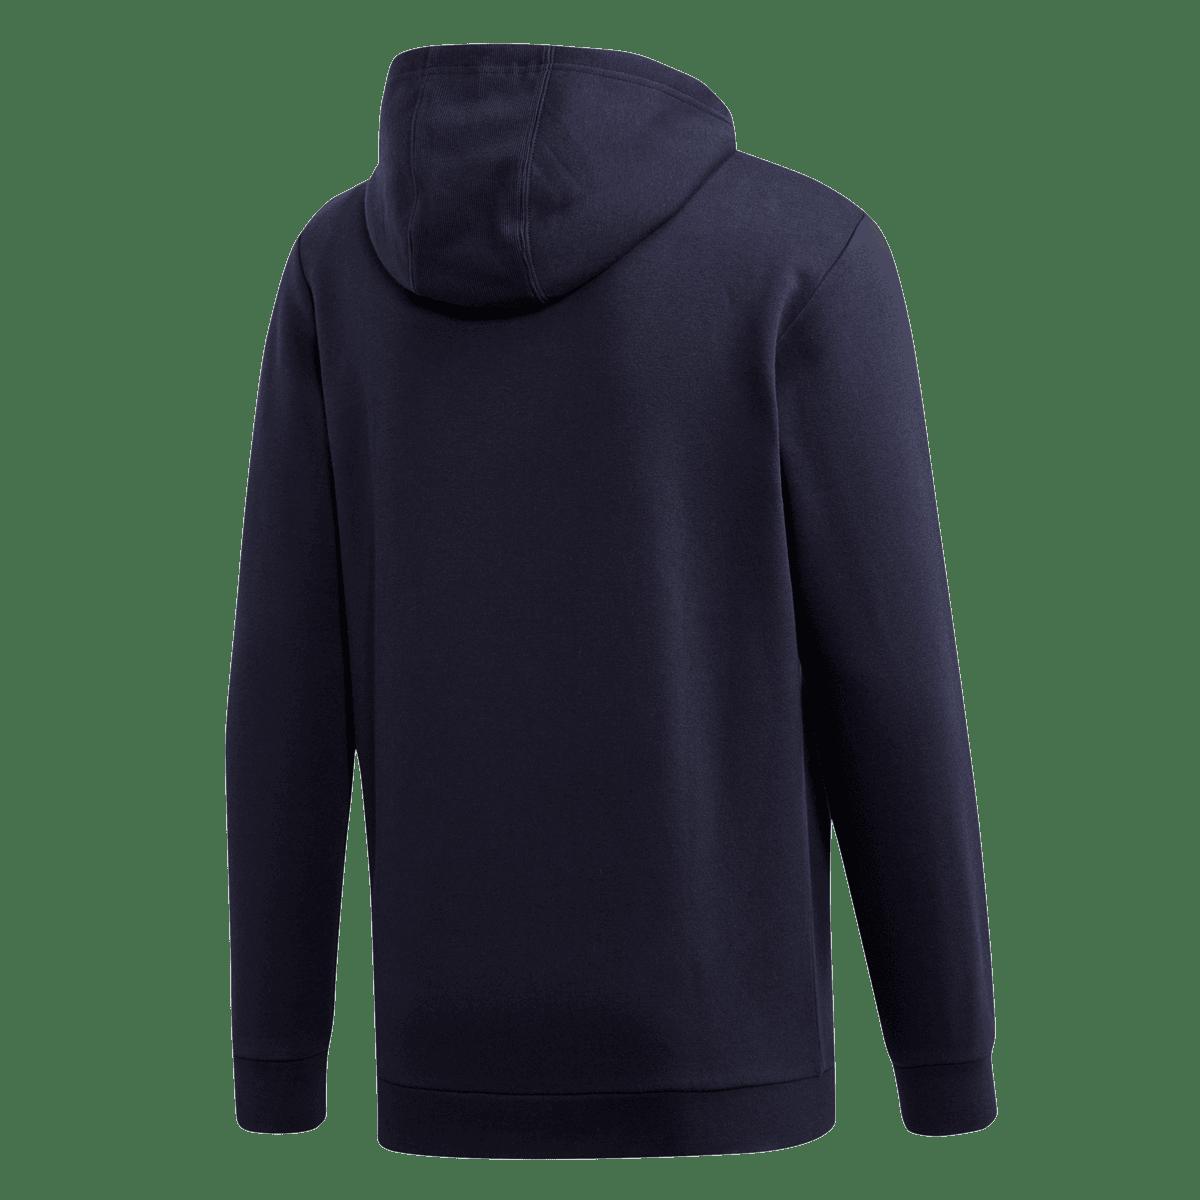 adidas capuchonjack Essential Camo Linear FZ Jacket donkerblauwblauw